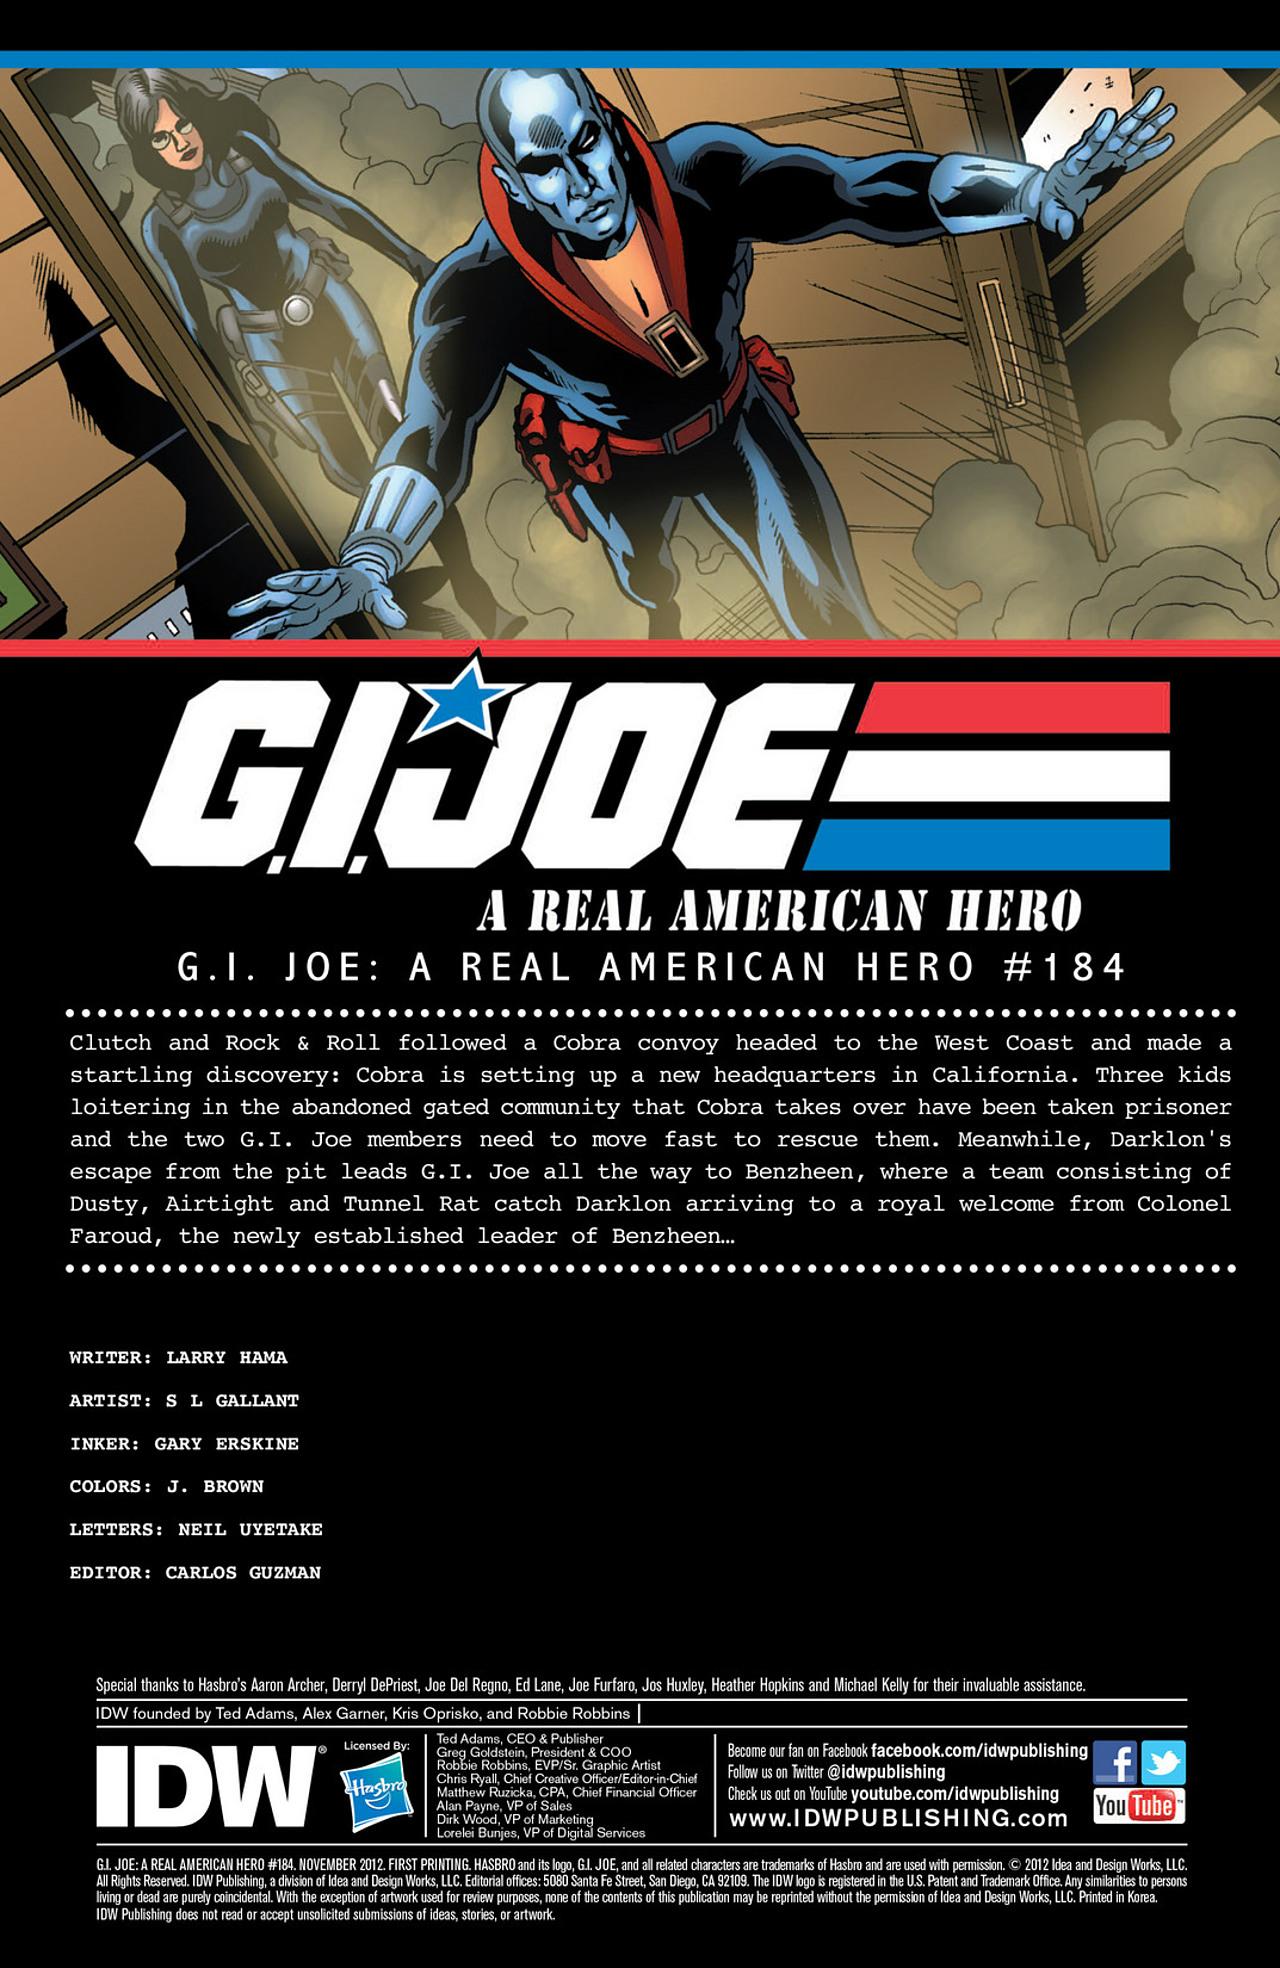 G.I. Joe: A Real American Hero 184 Page 1